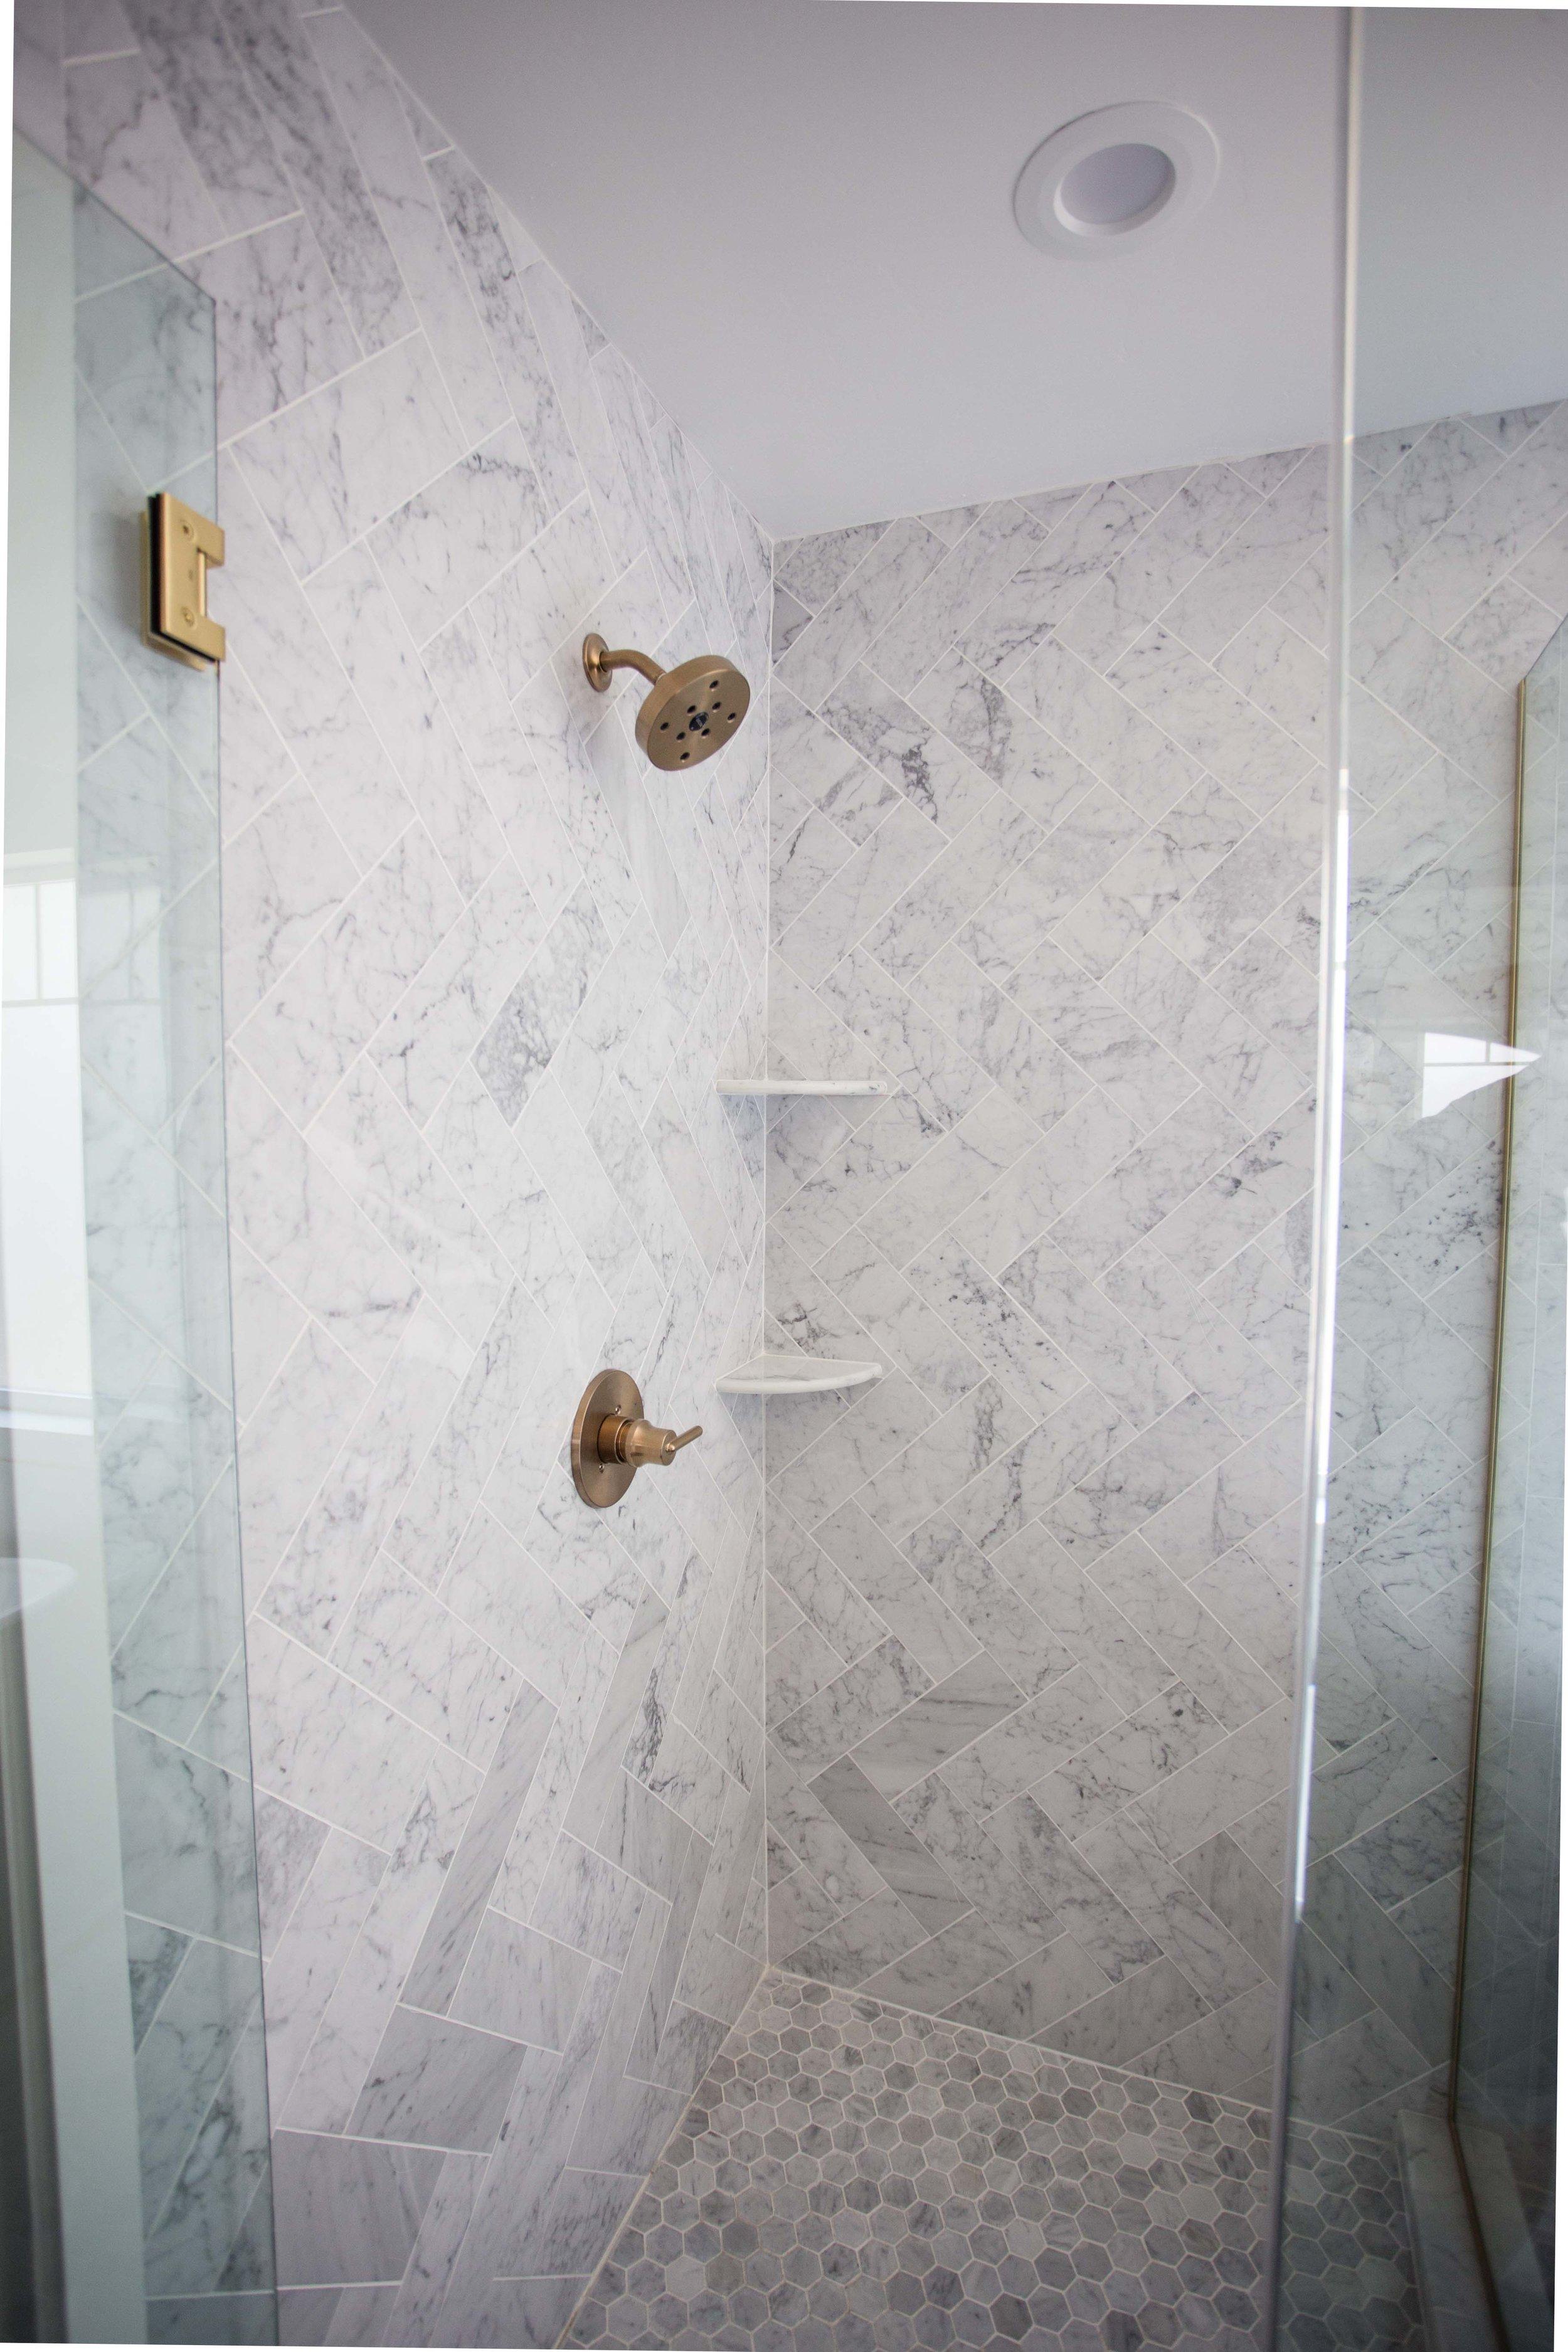 Herringbone patterned tile